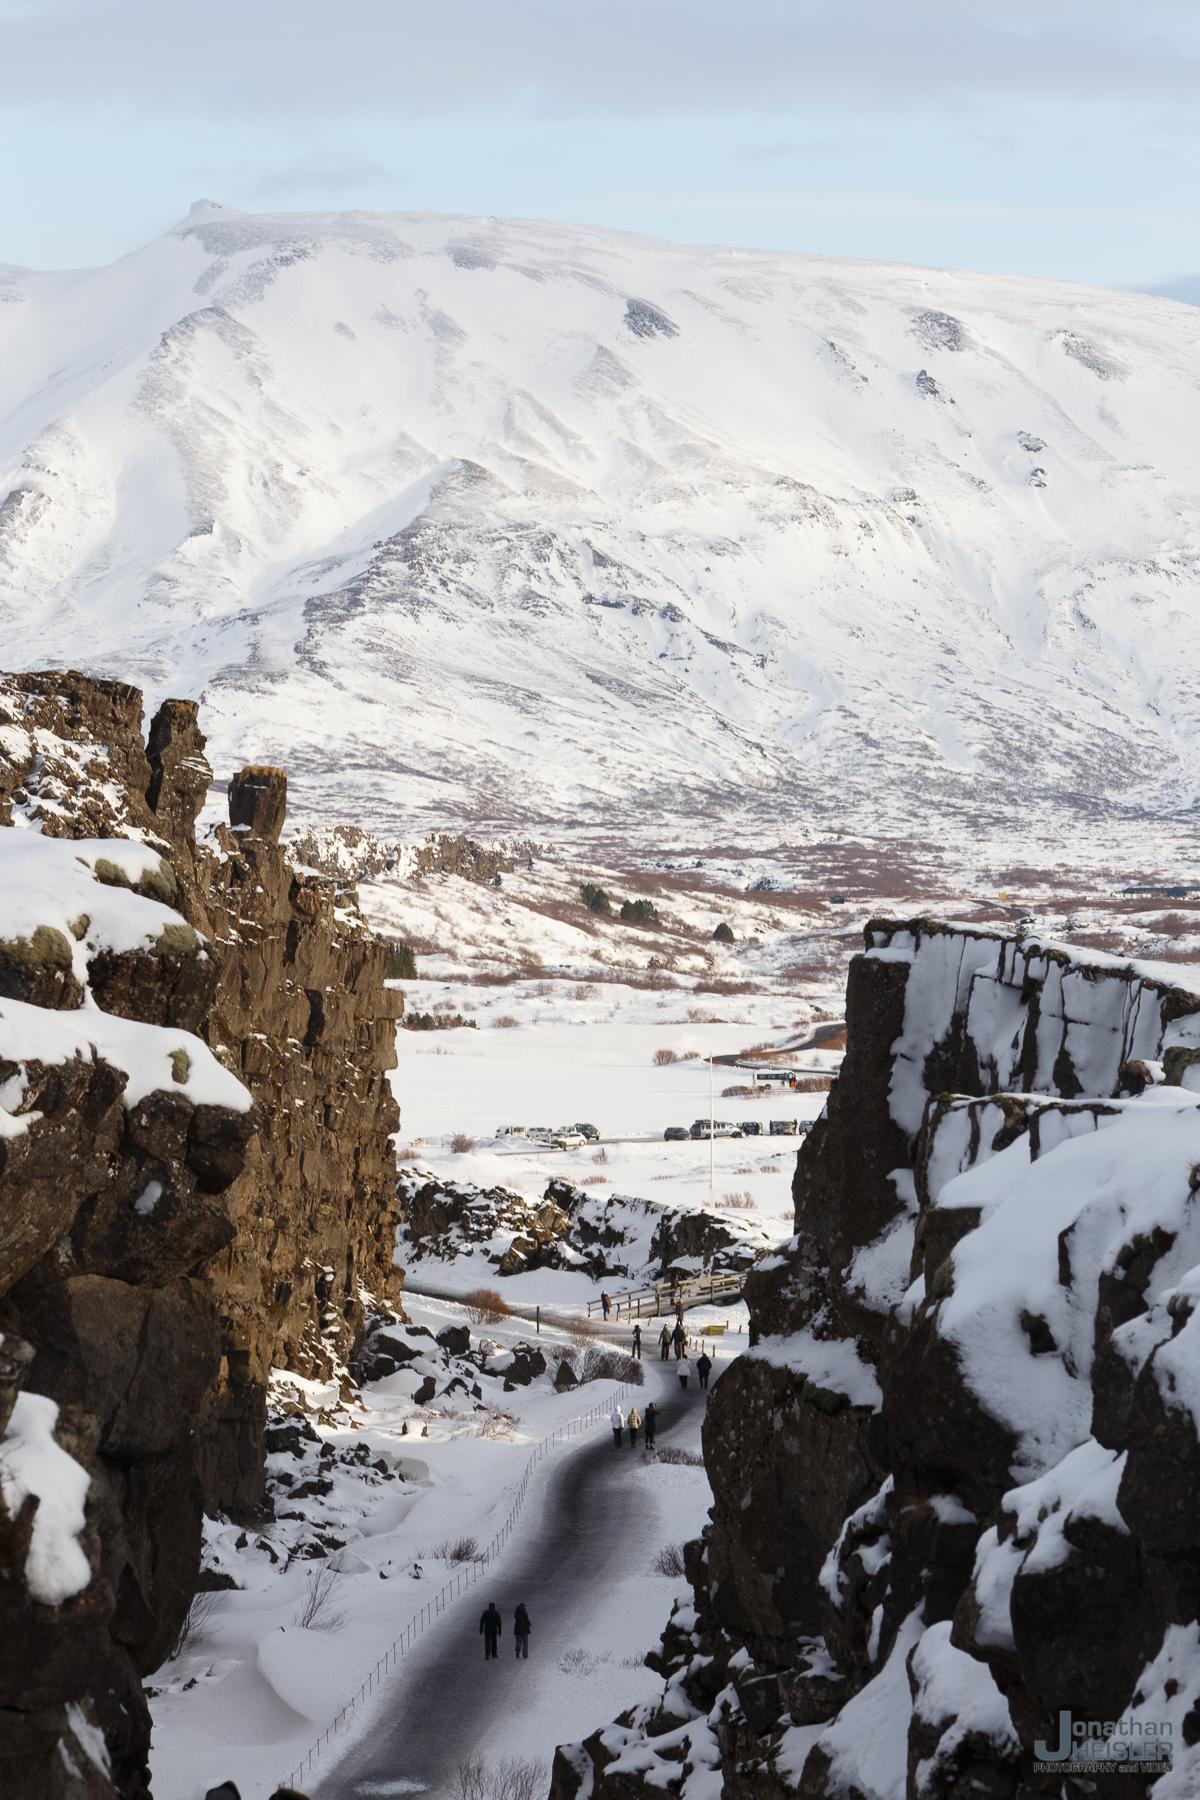 Iceland Winter Photos_  Jonathan Heisler __  02292016 _ 005.jpg